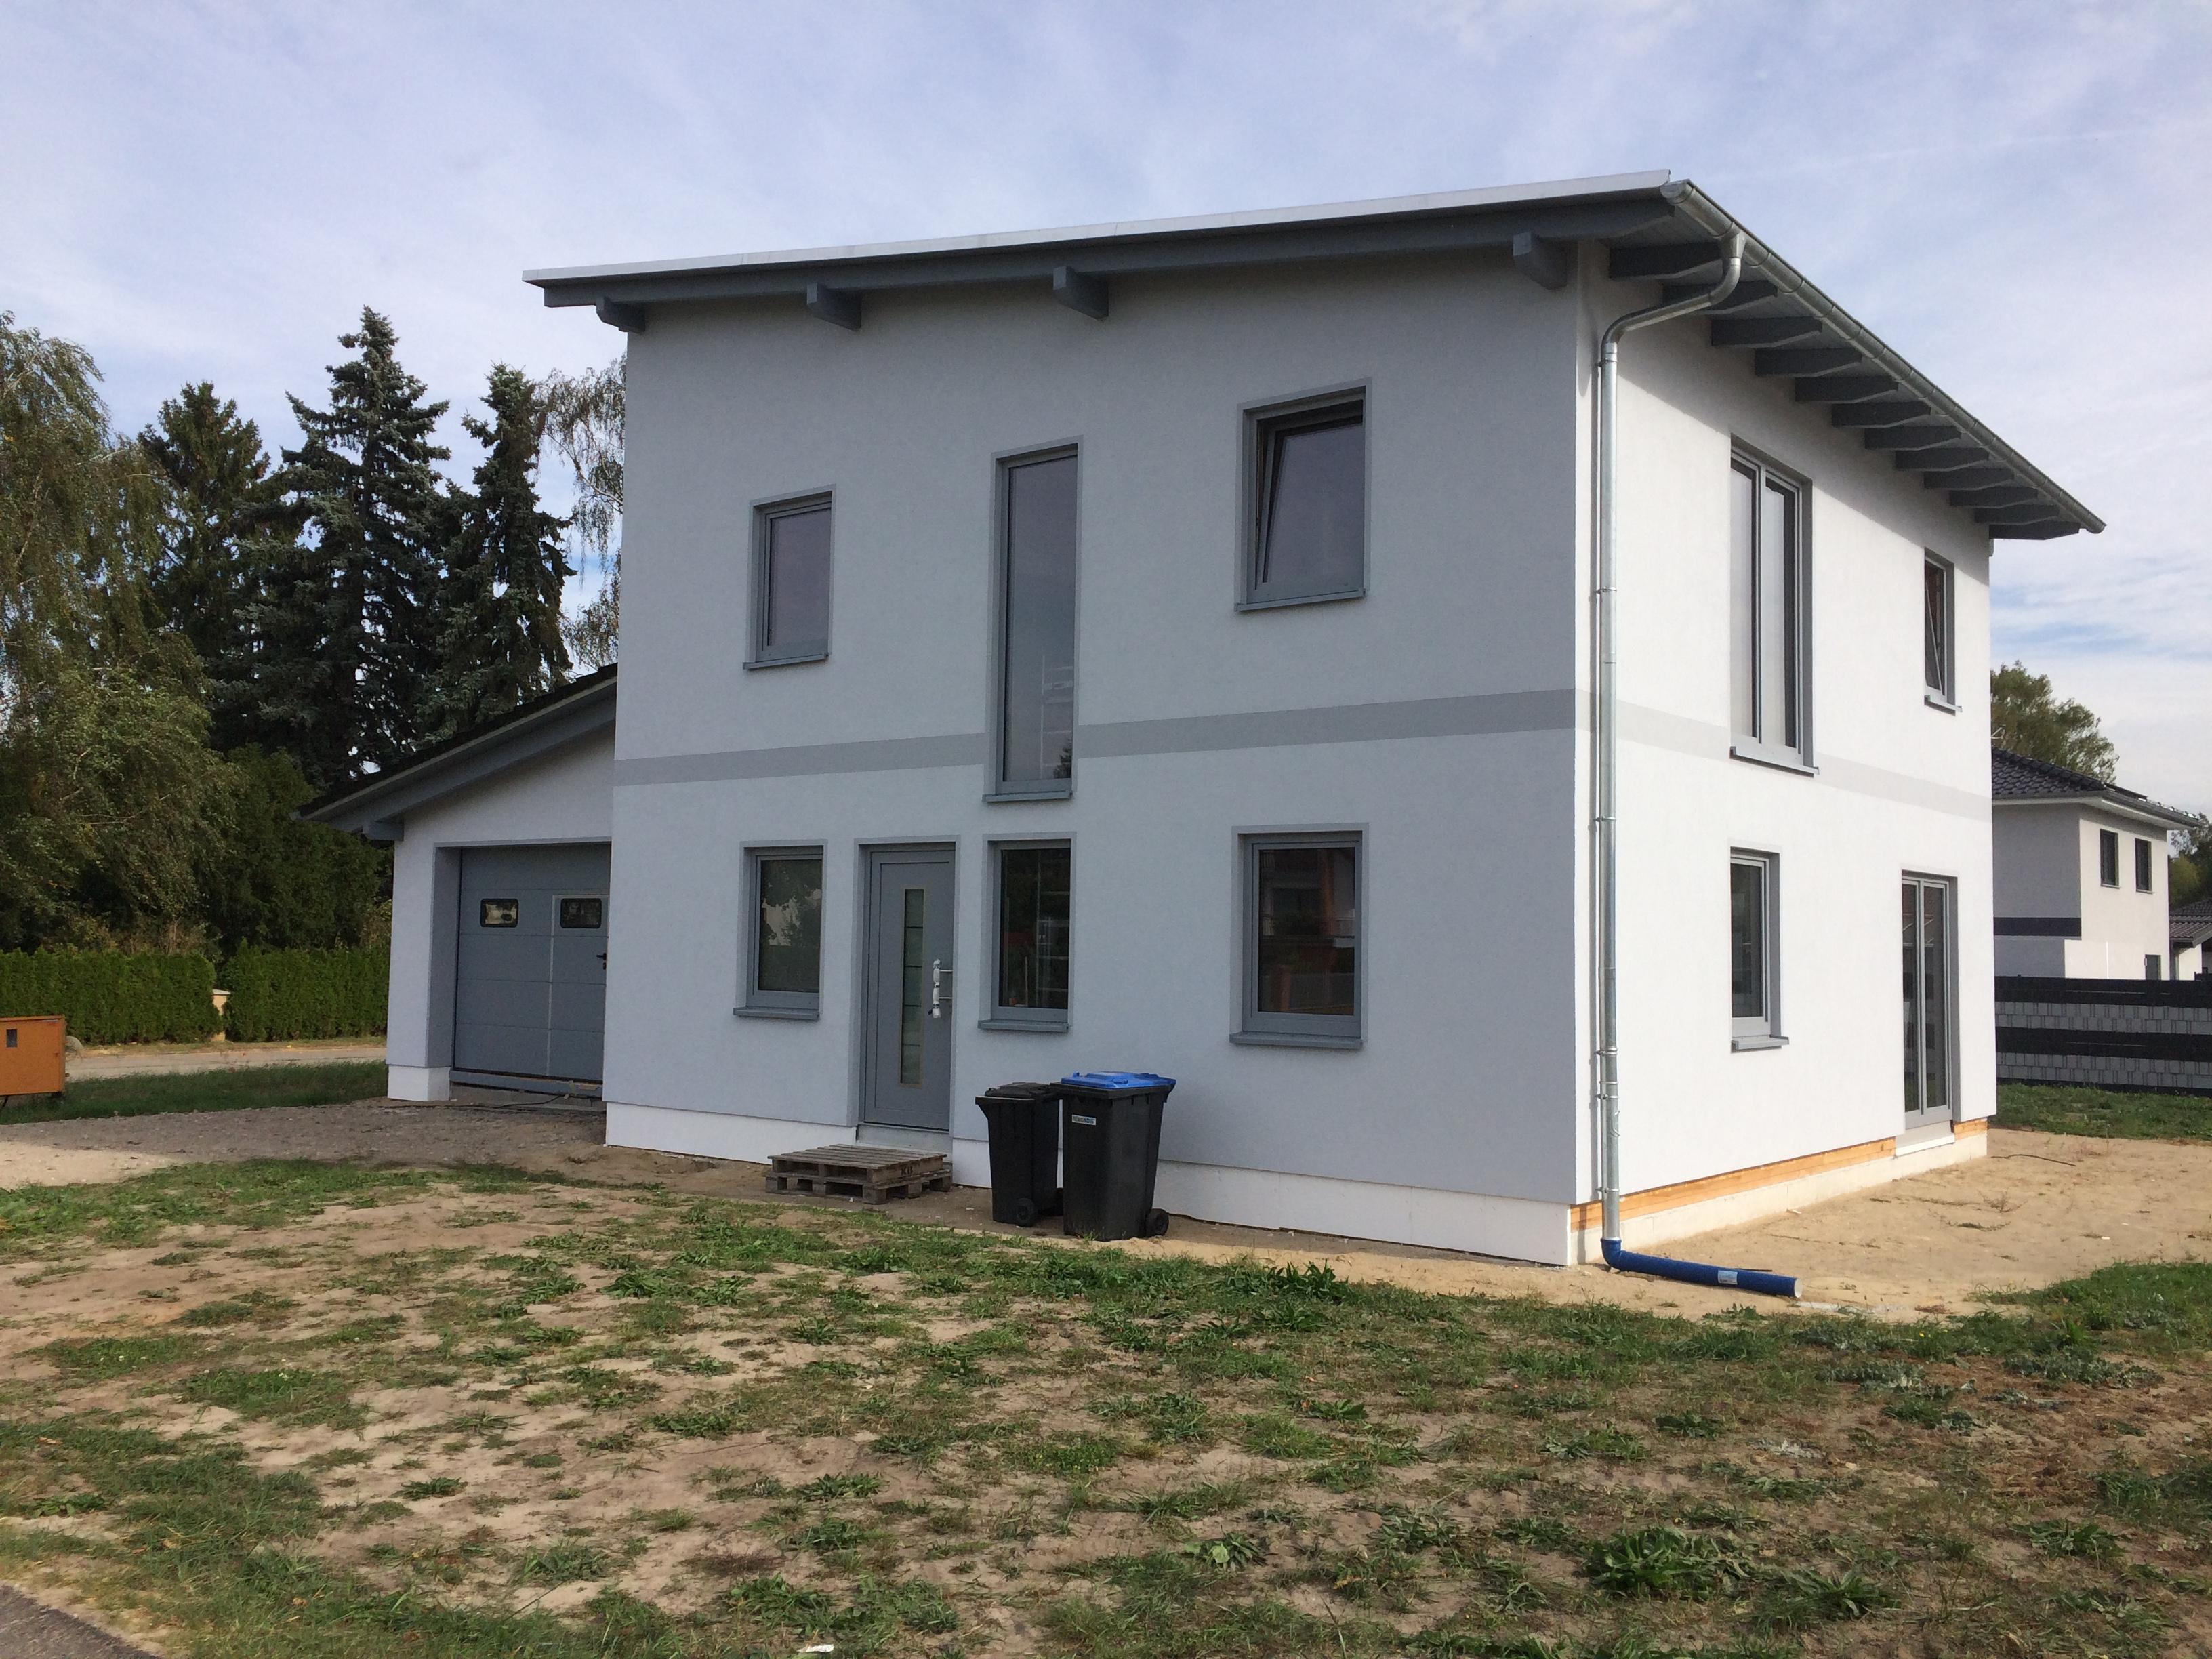 Projekt: Pultdach mit Anbau - HOKO Fertighaus GmbH Ueckermünde ...